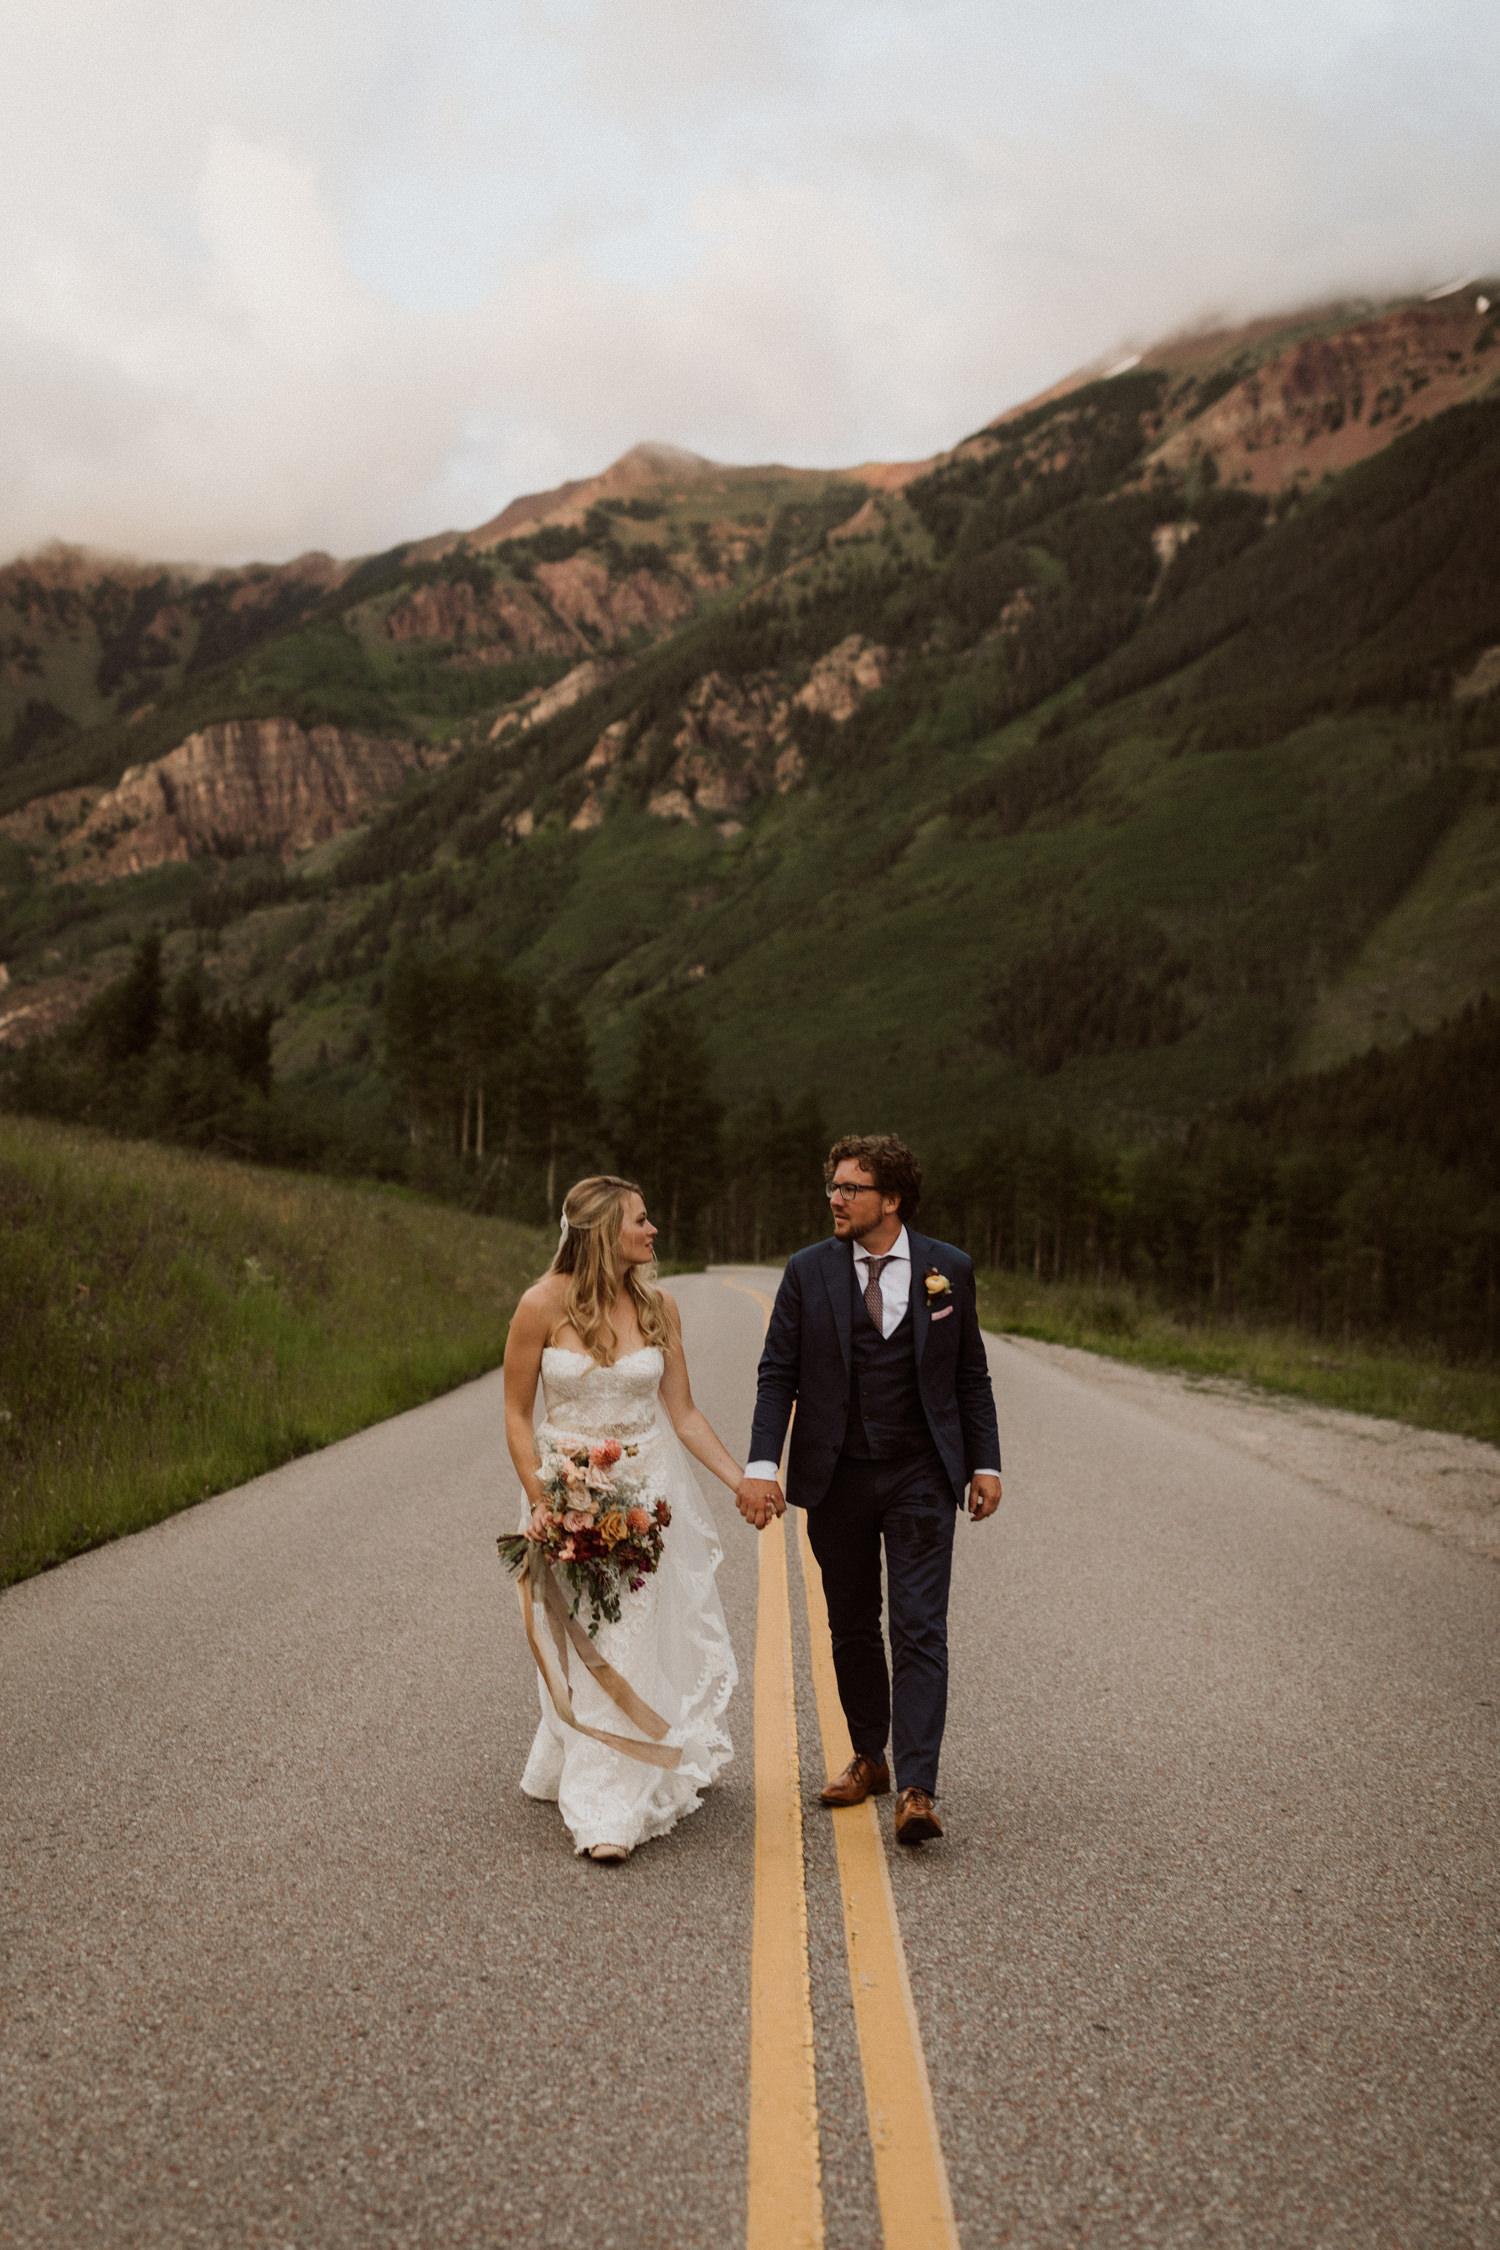 18_bohemian-wedding-in-aspen-colorado-22.jpg